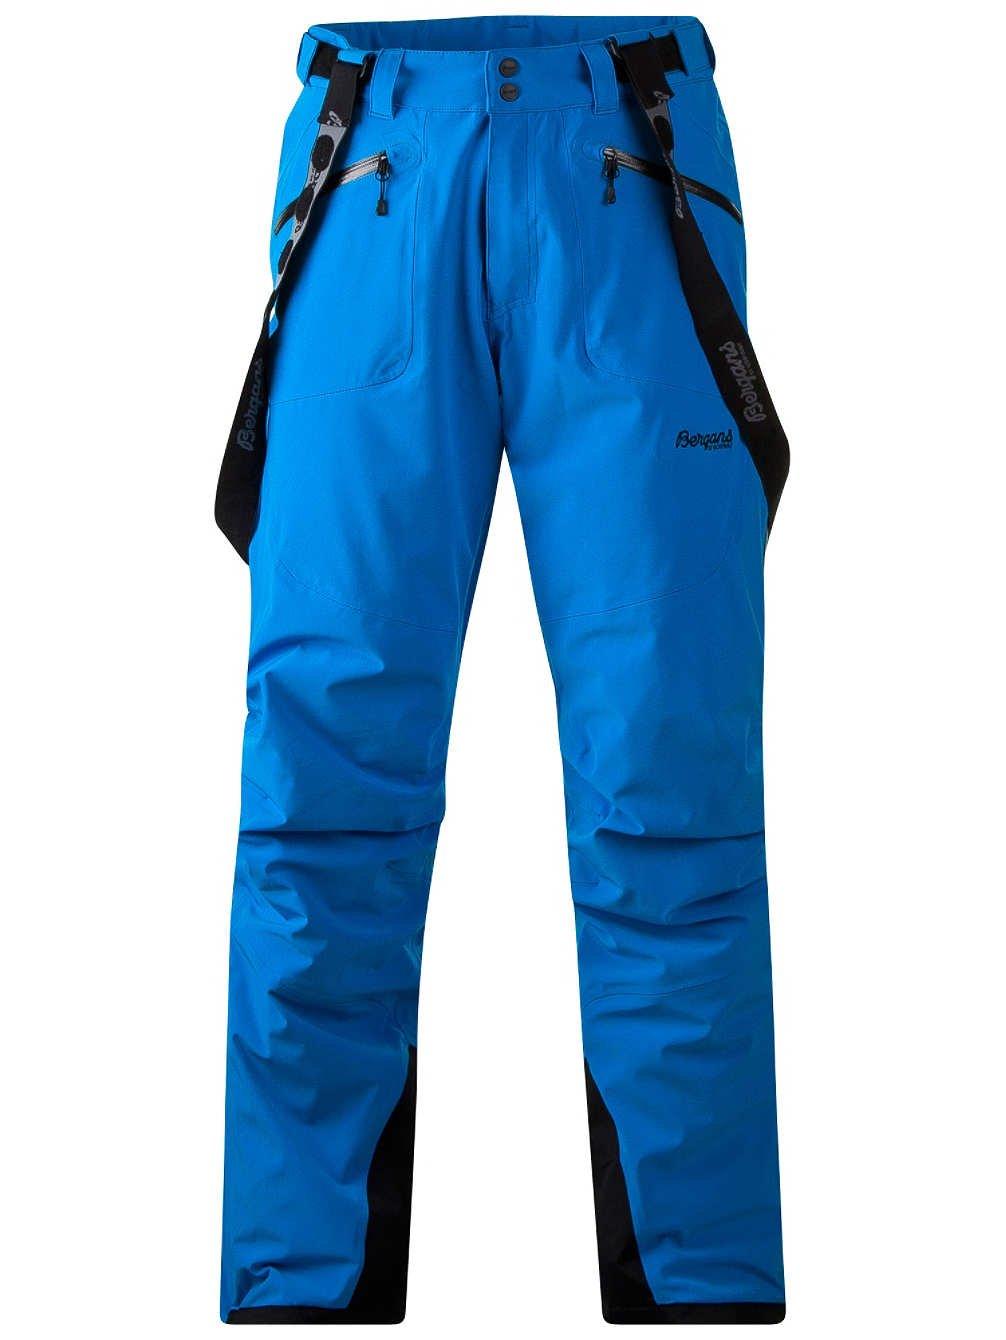 Bergans Herren Hose Oppdal Insulated pants günstig online kaufen